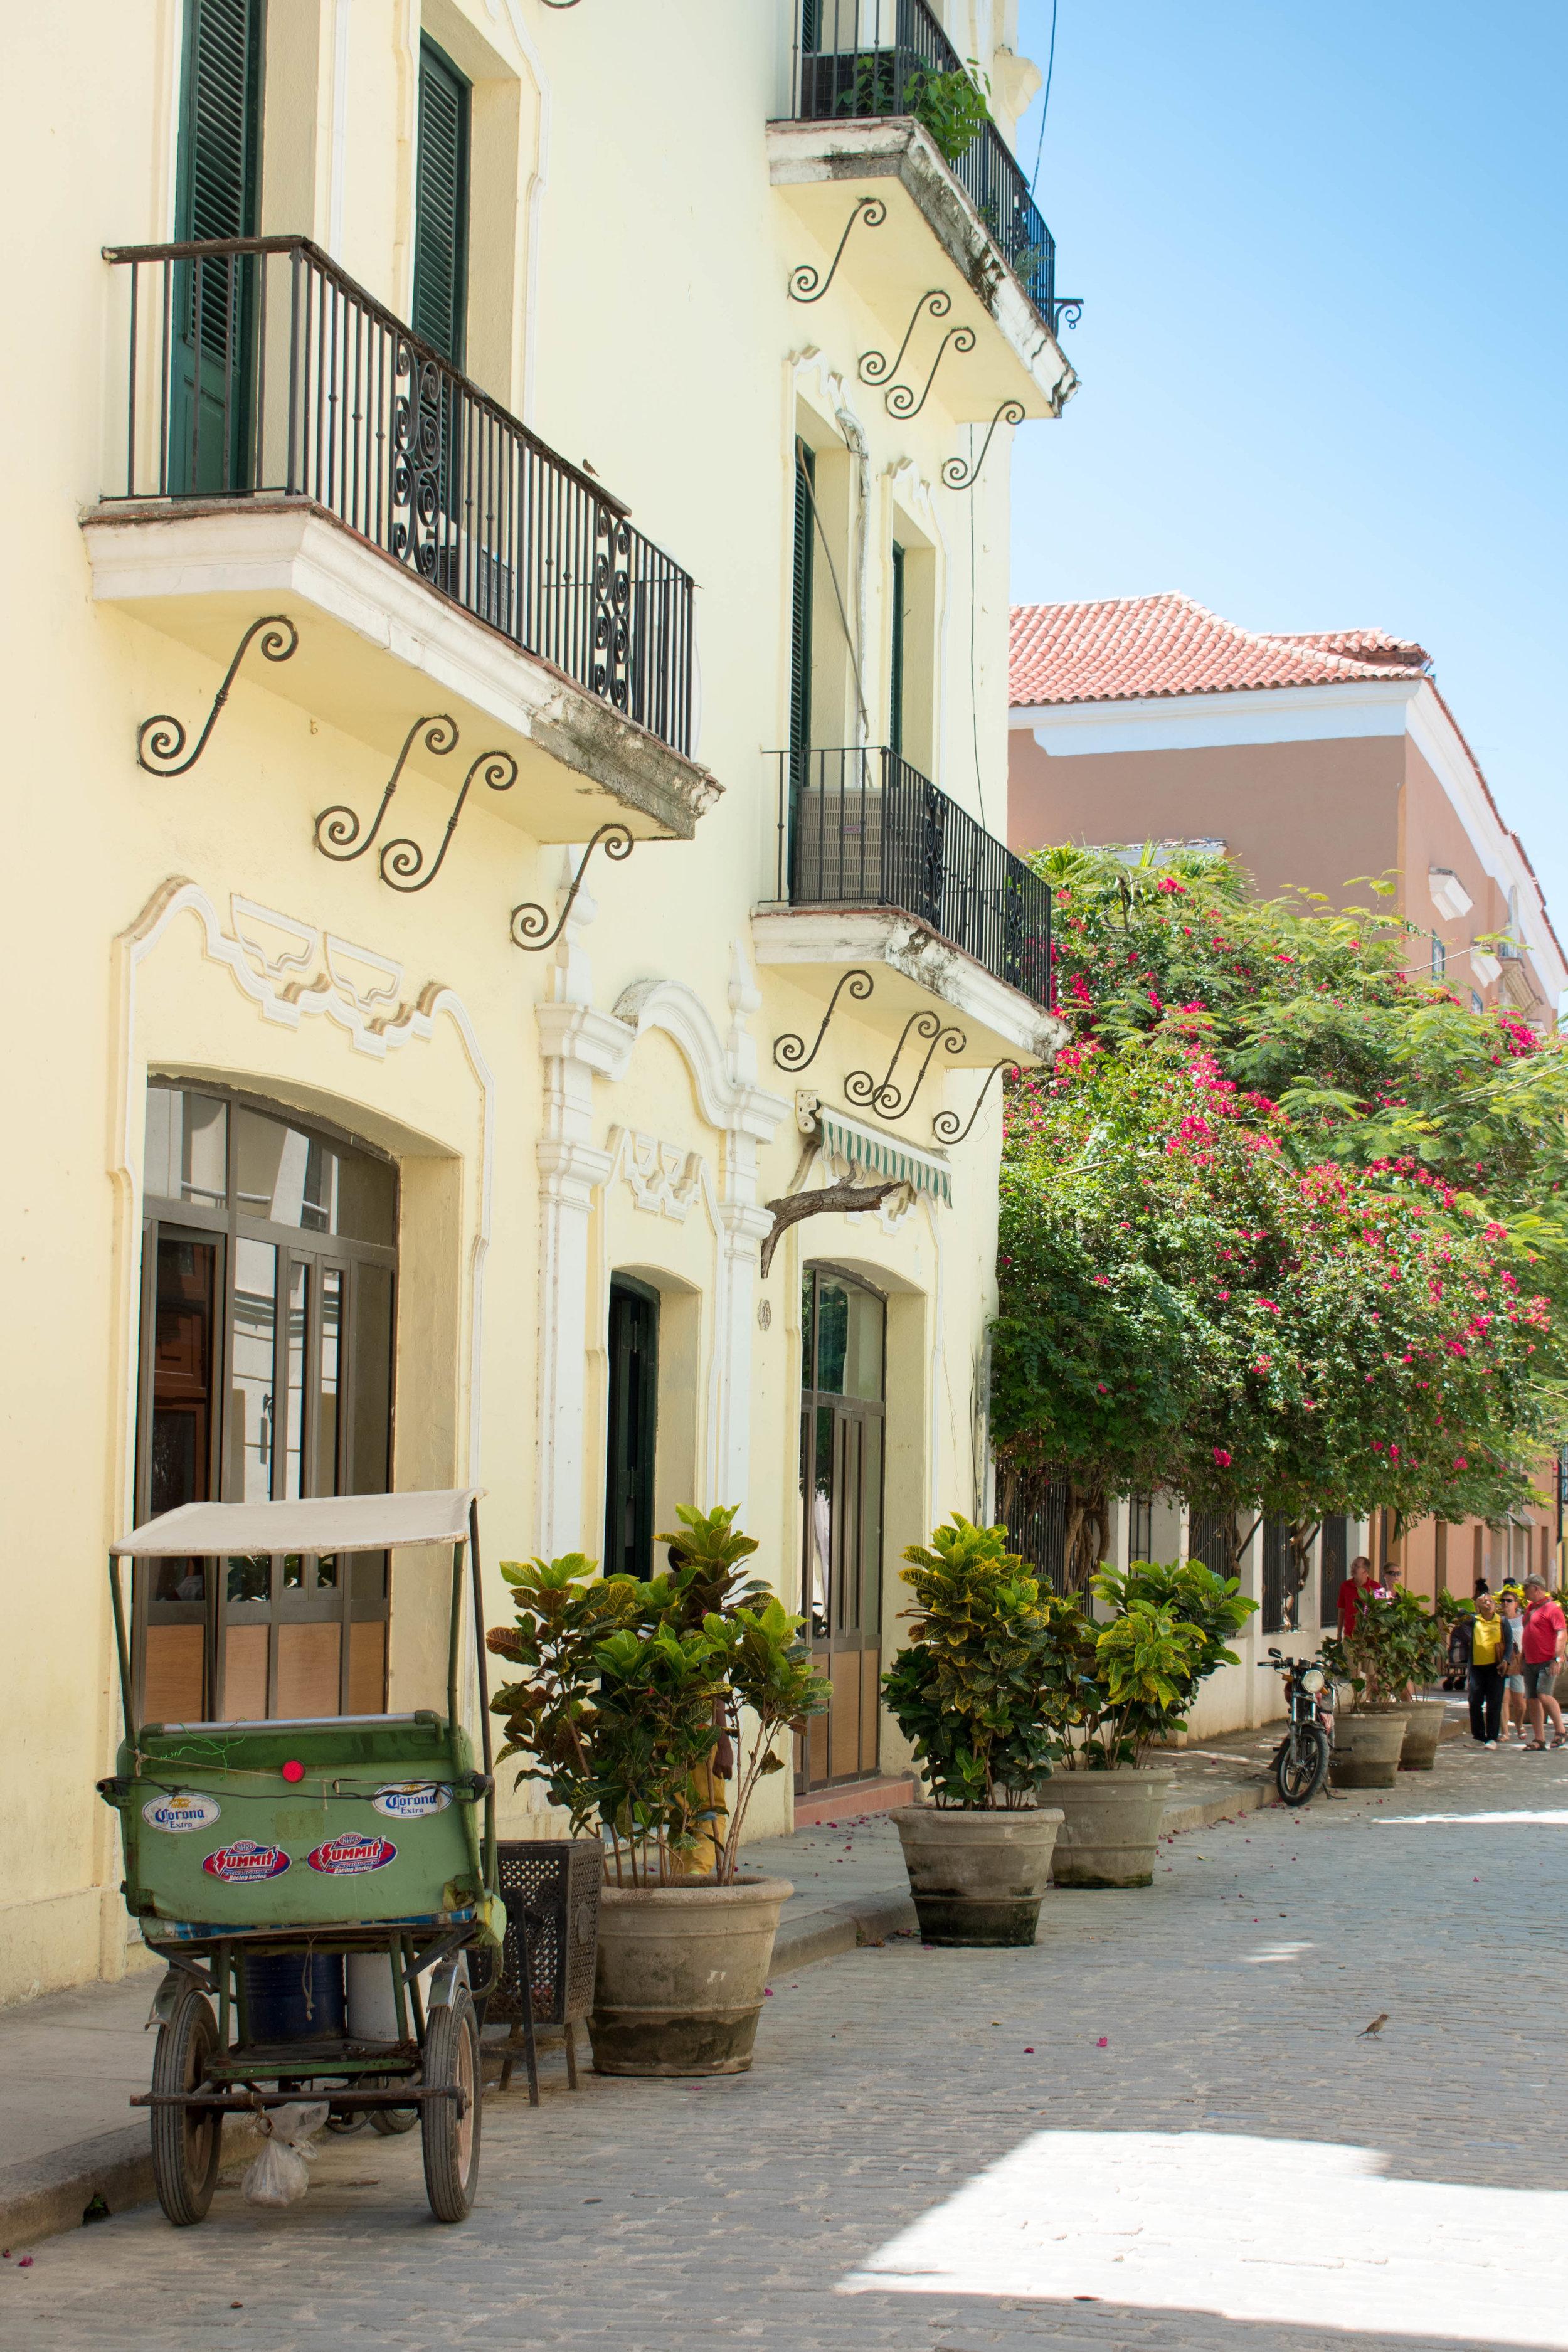 Perfectly Restored Old Havana in Cuba